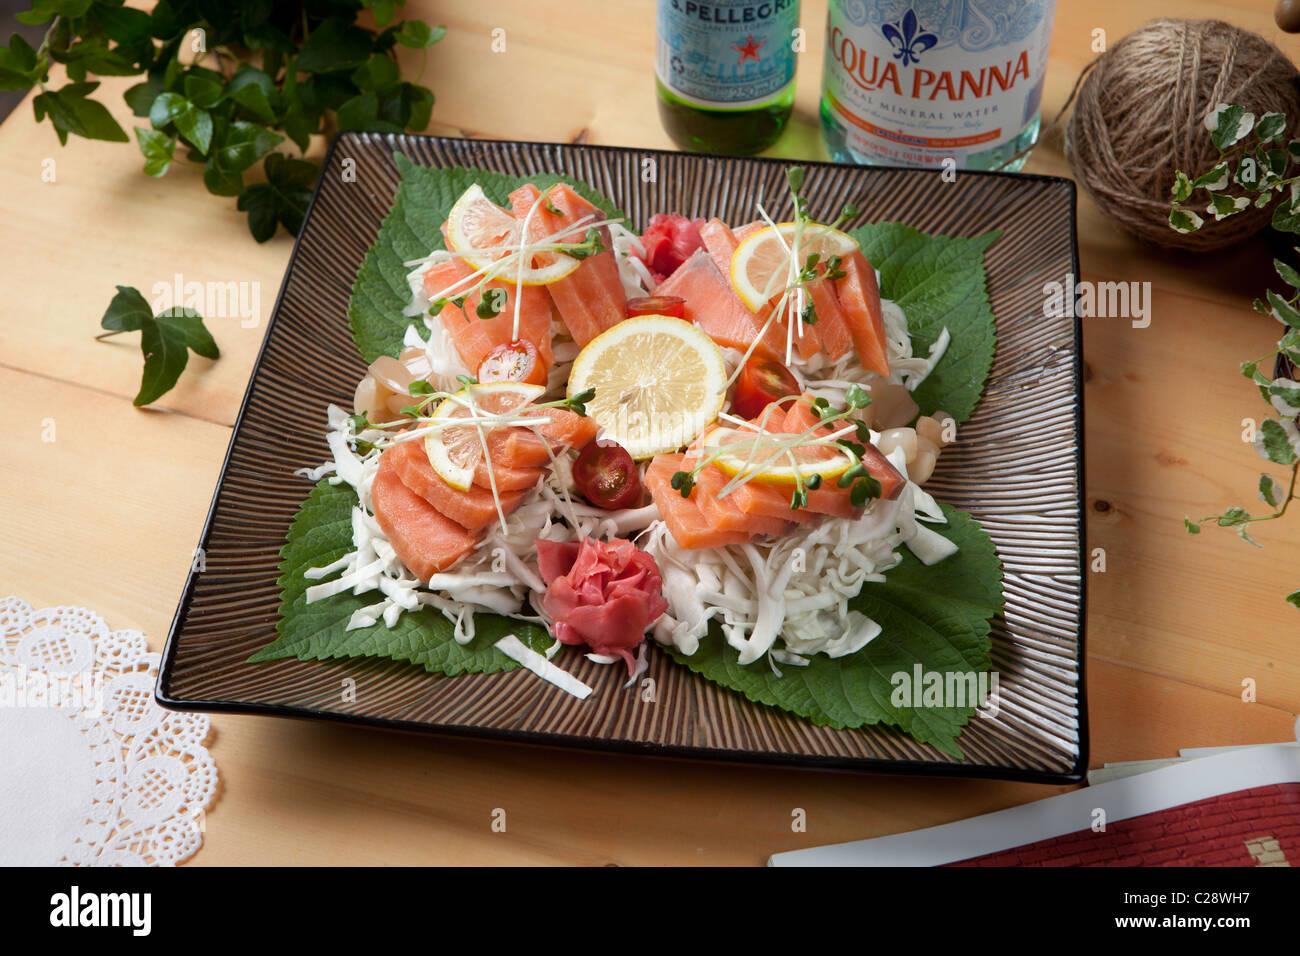 Korean food sale on restaurant , South Korea Salmon sashimi (Raw fish) with lemon and garlic - Stock Image